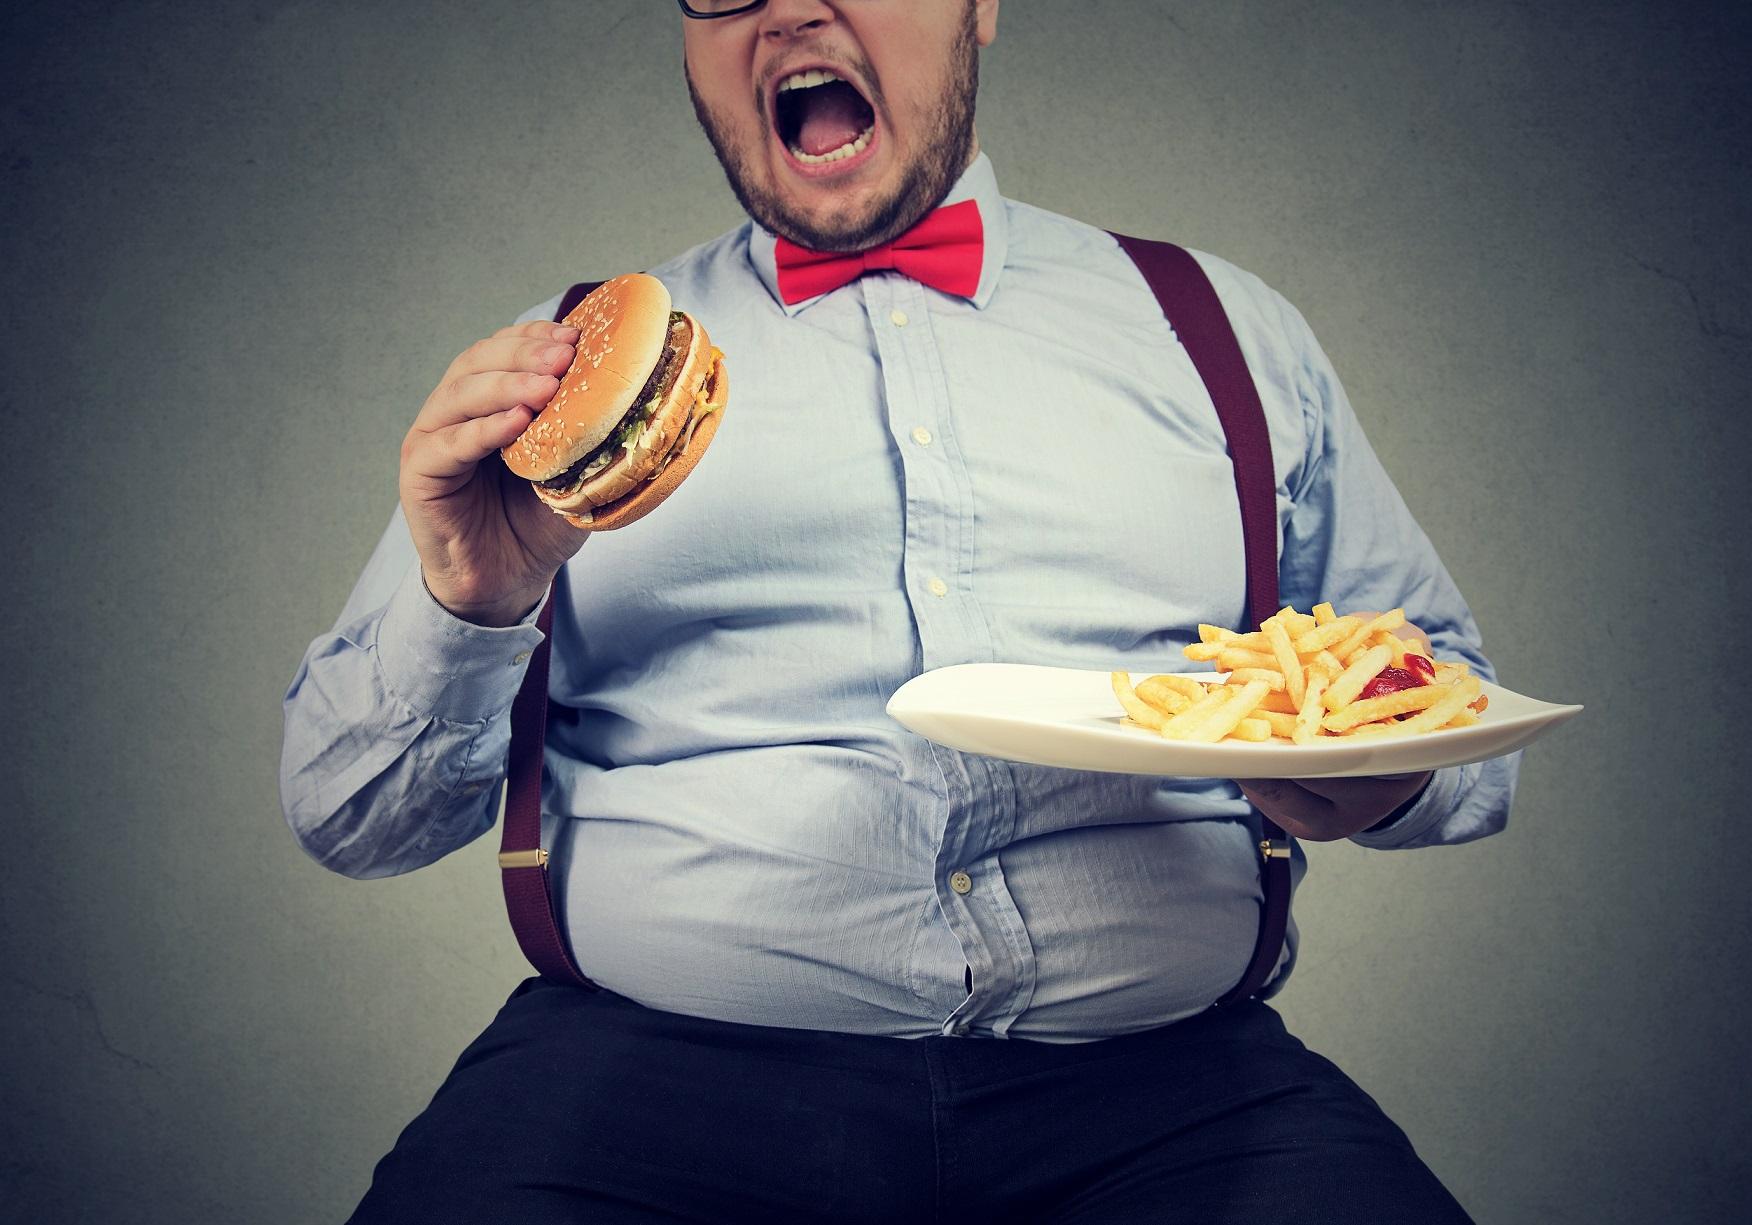 Weight Loss Program: Weight Loss Program To Lose 20 Pounds